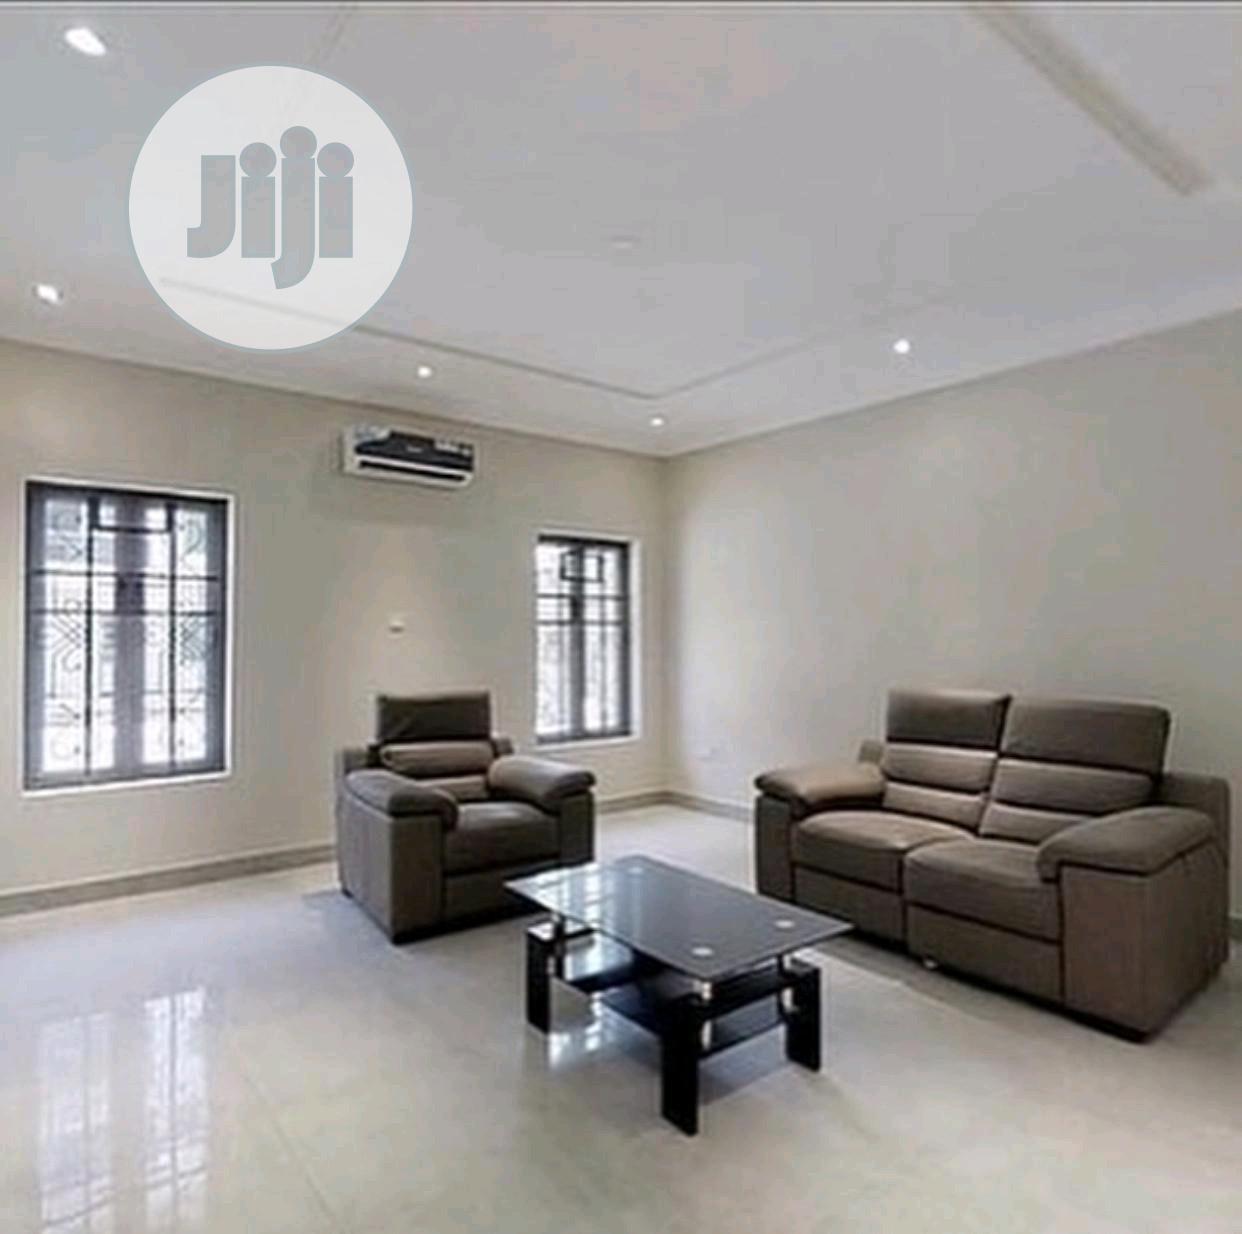 Newly Built Units Of 1BR Apartments (Miniflats) In Lekki